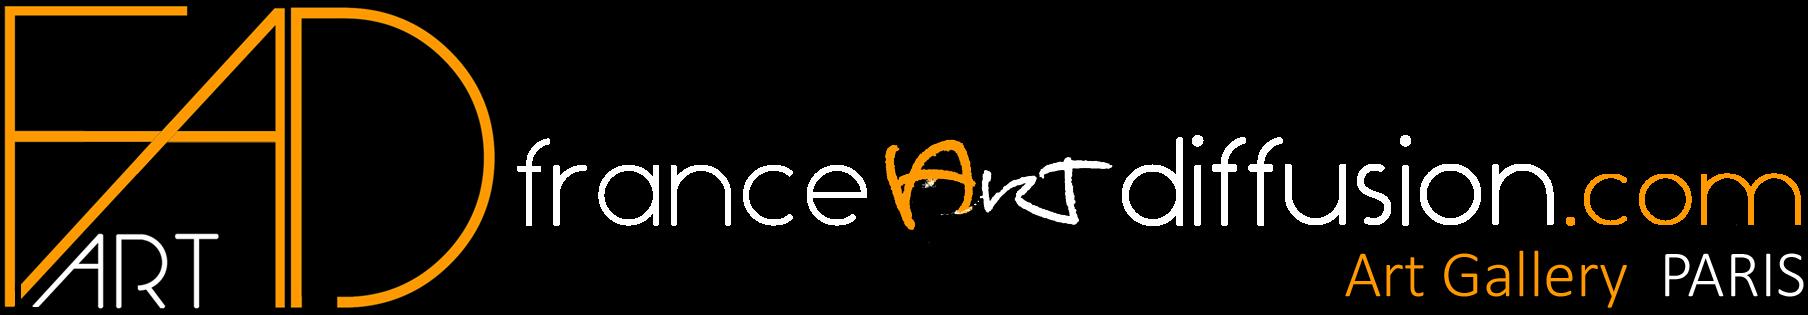 Logo franceartdiffusion